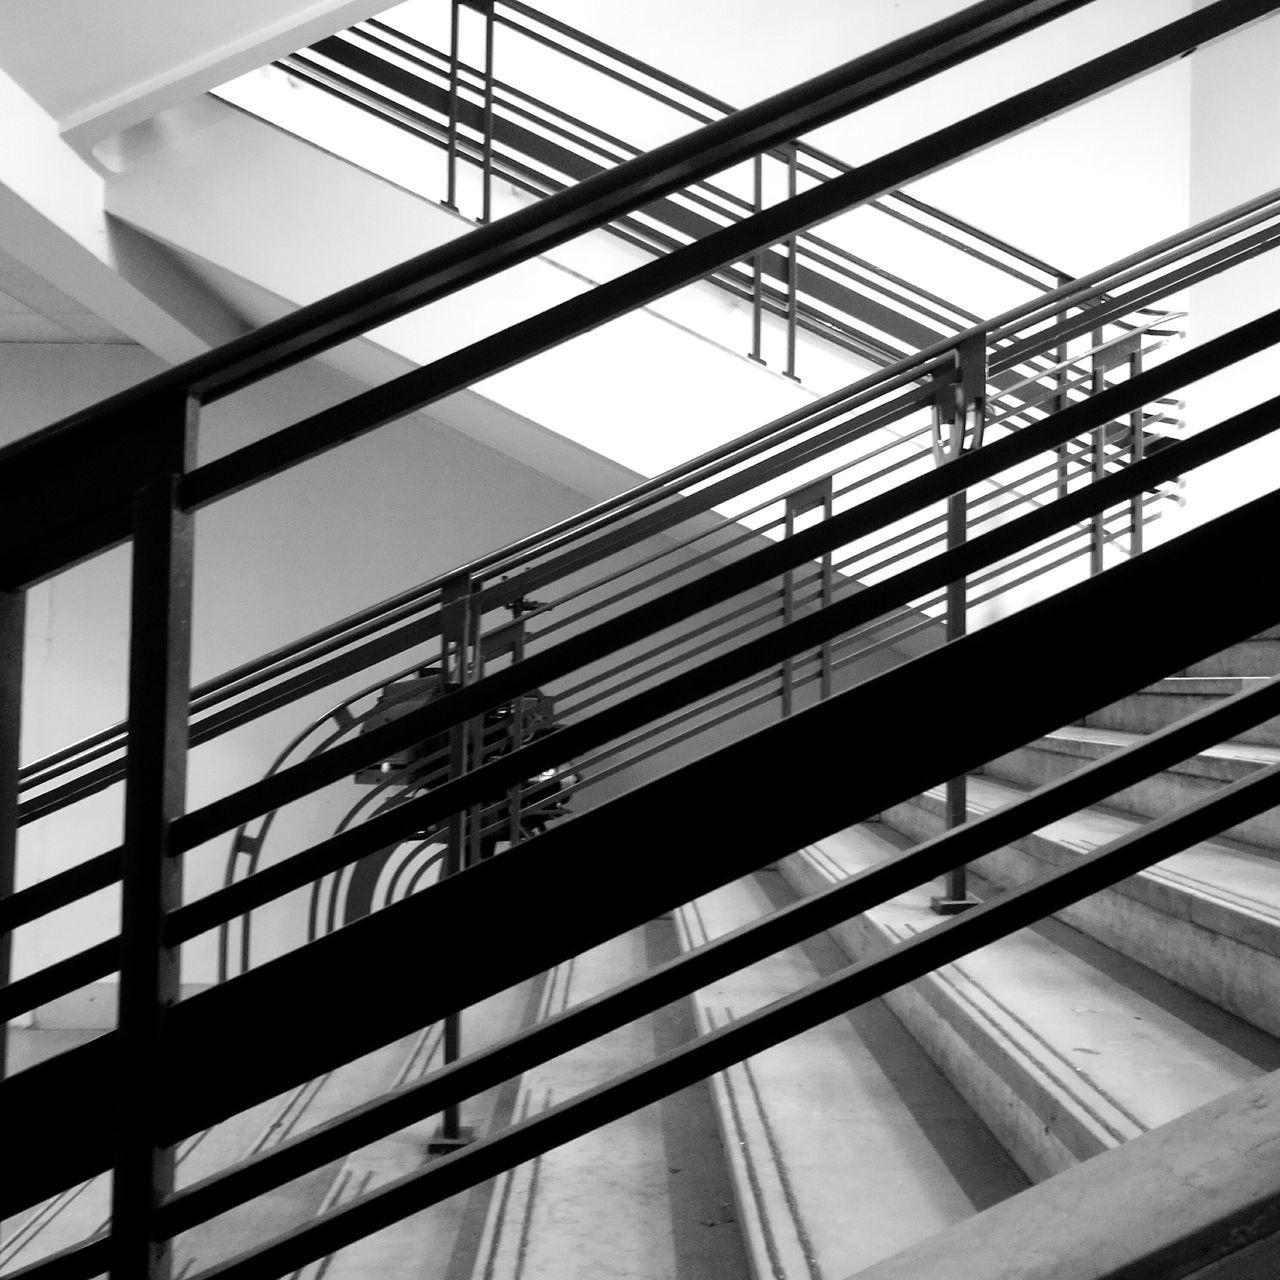 Architecture No People Indoors  Black And White Silhouette Noir Et Blanc Blackandwhite Photography Entre Ombre Et Lumiere Textures And Surfaces Monochrome Photography Old Eyemphotography Ambiance Steps